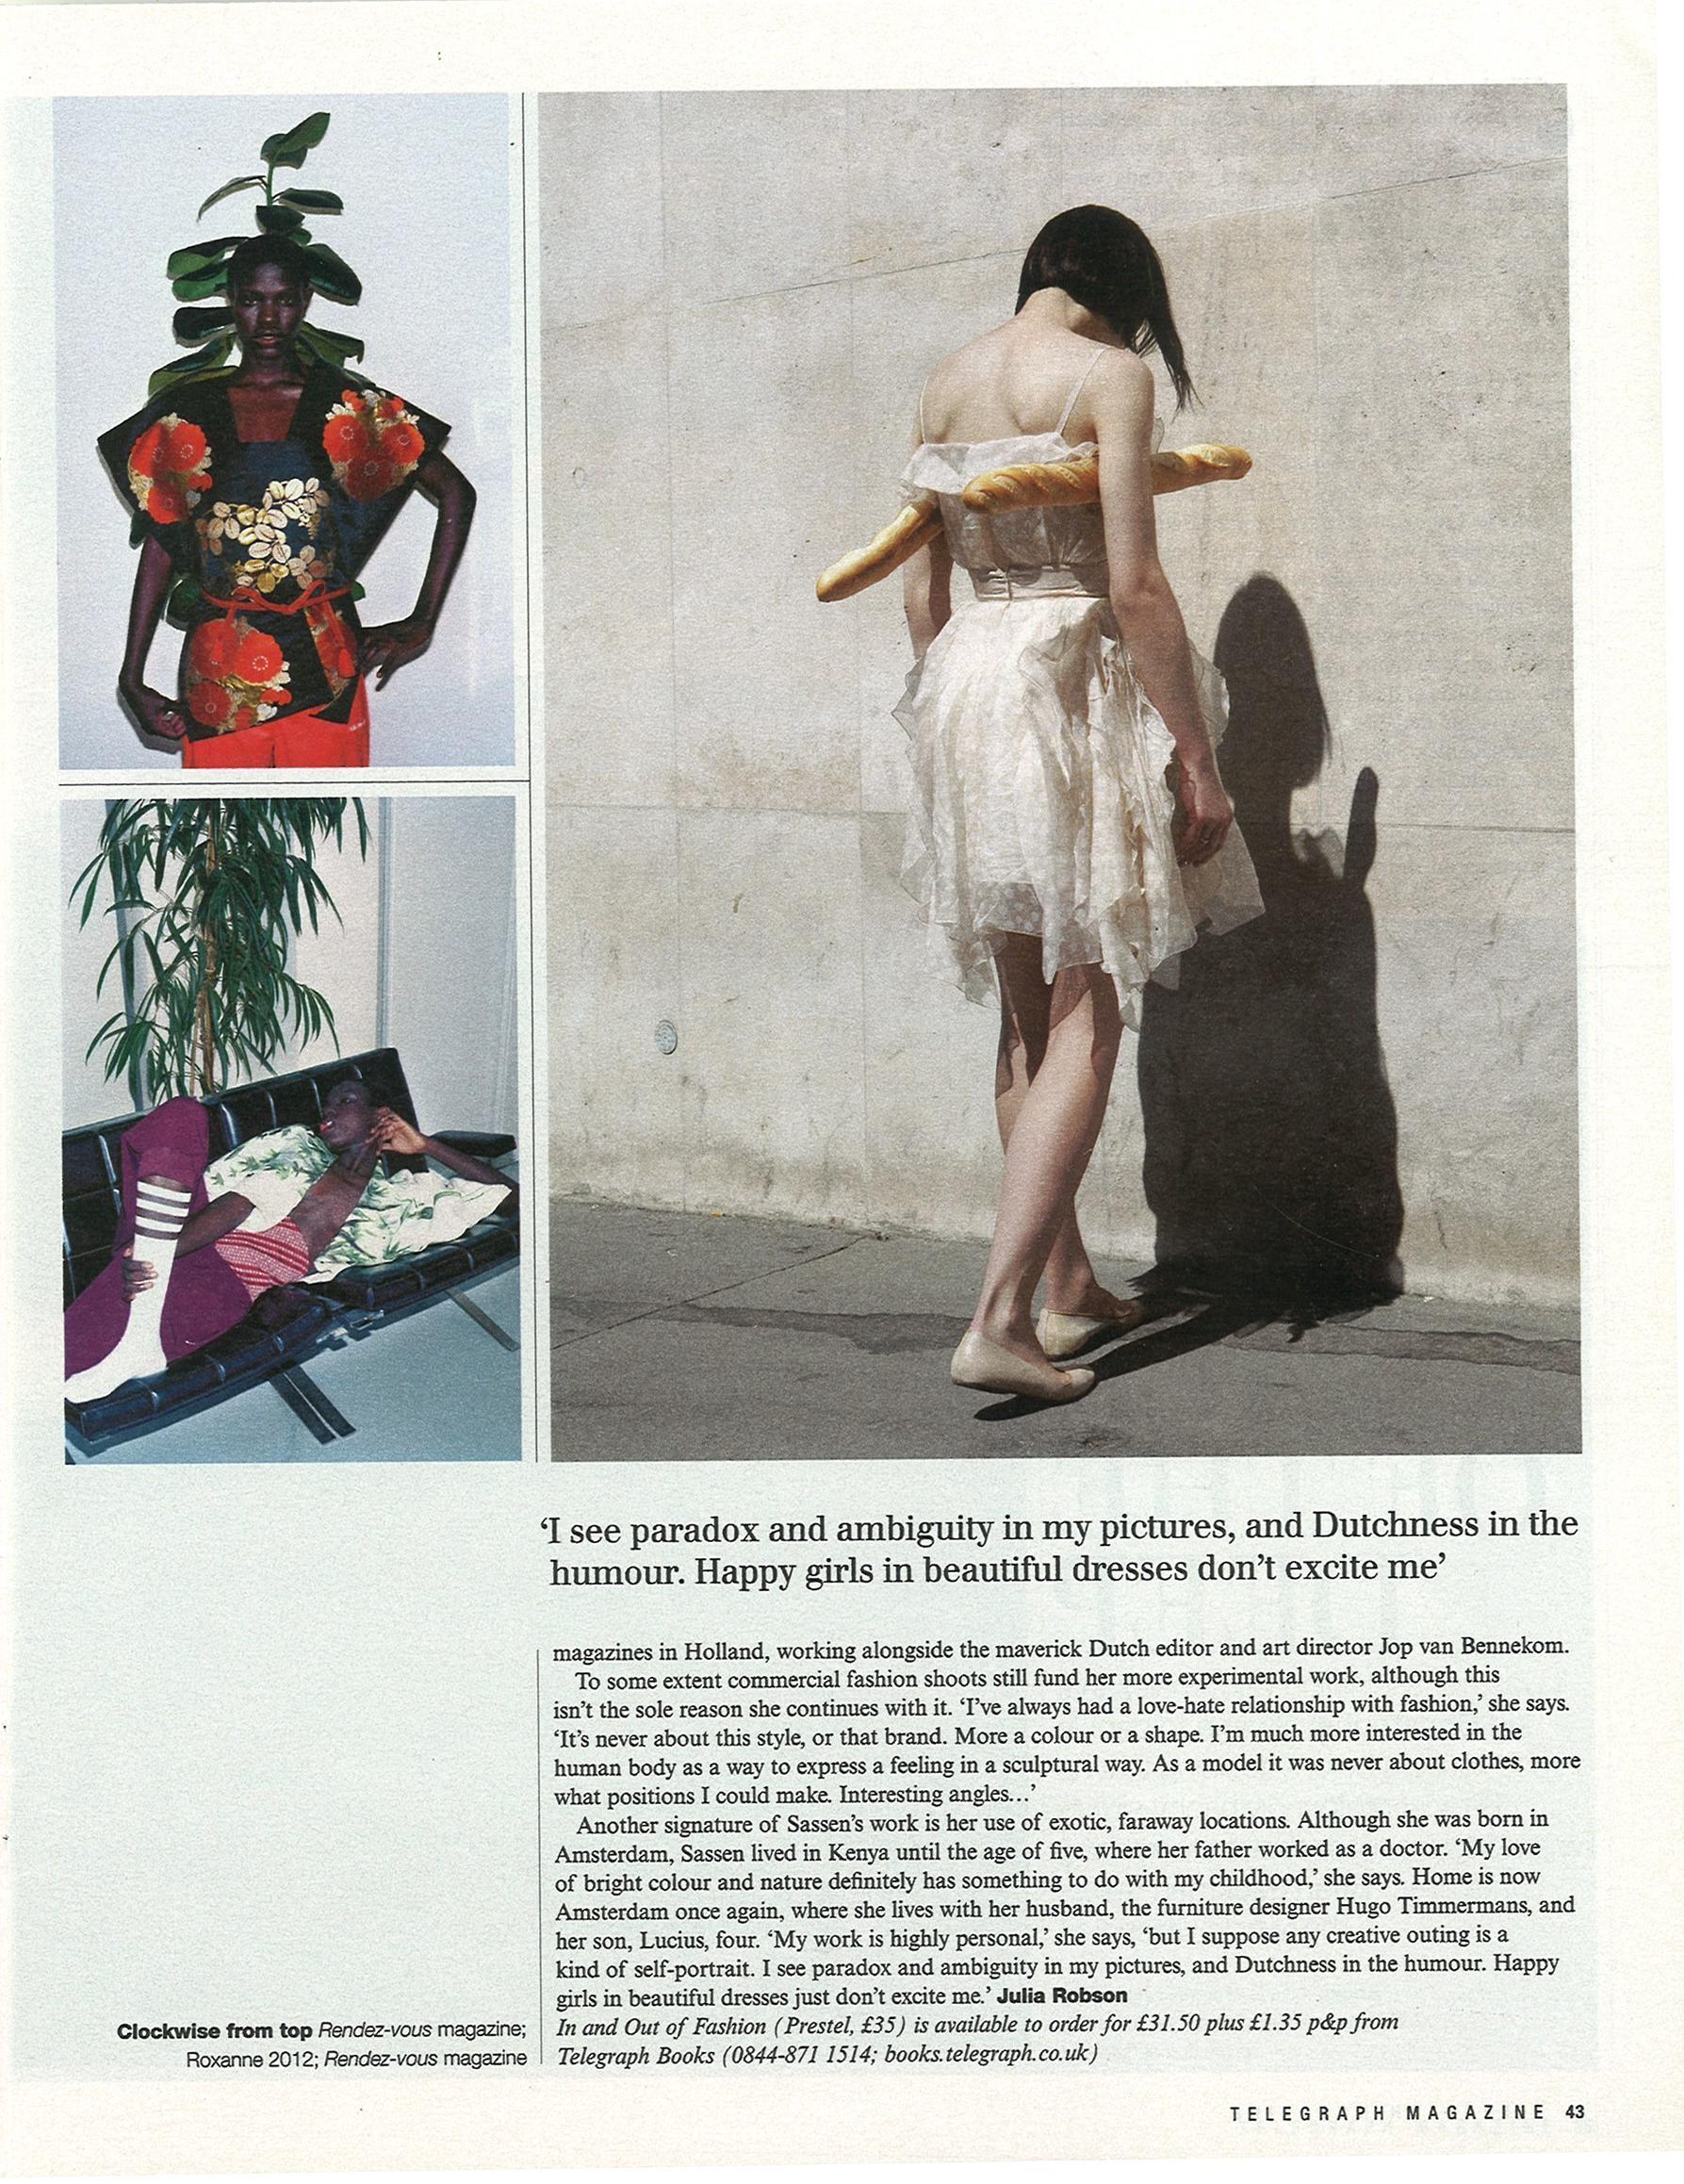 Julia-Robson-Viviane-Sassen-photographer-Telegraph-magazine-March-2013-4(of4)